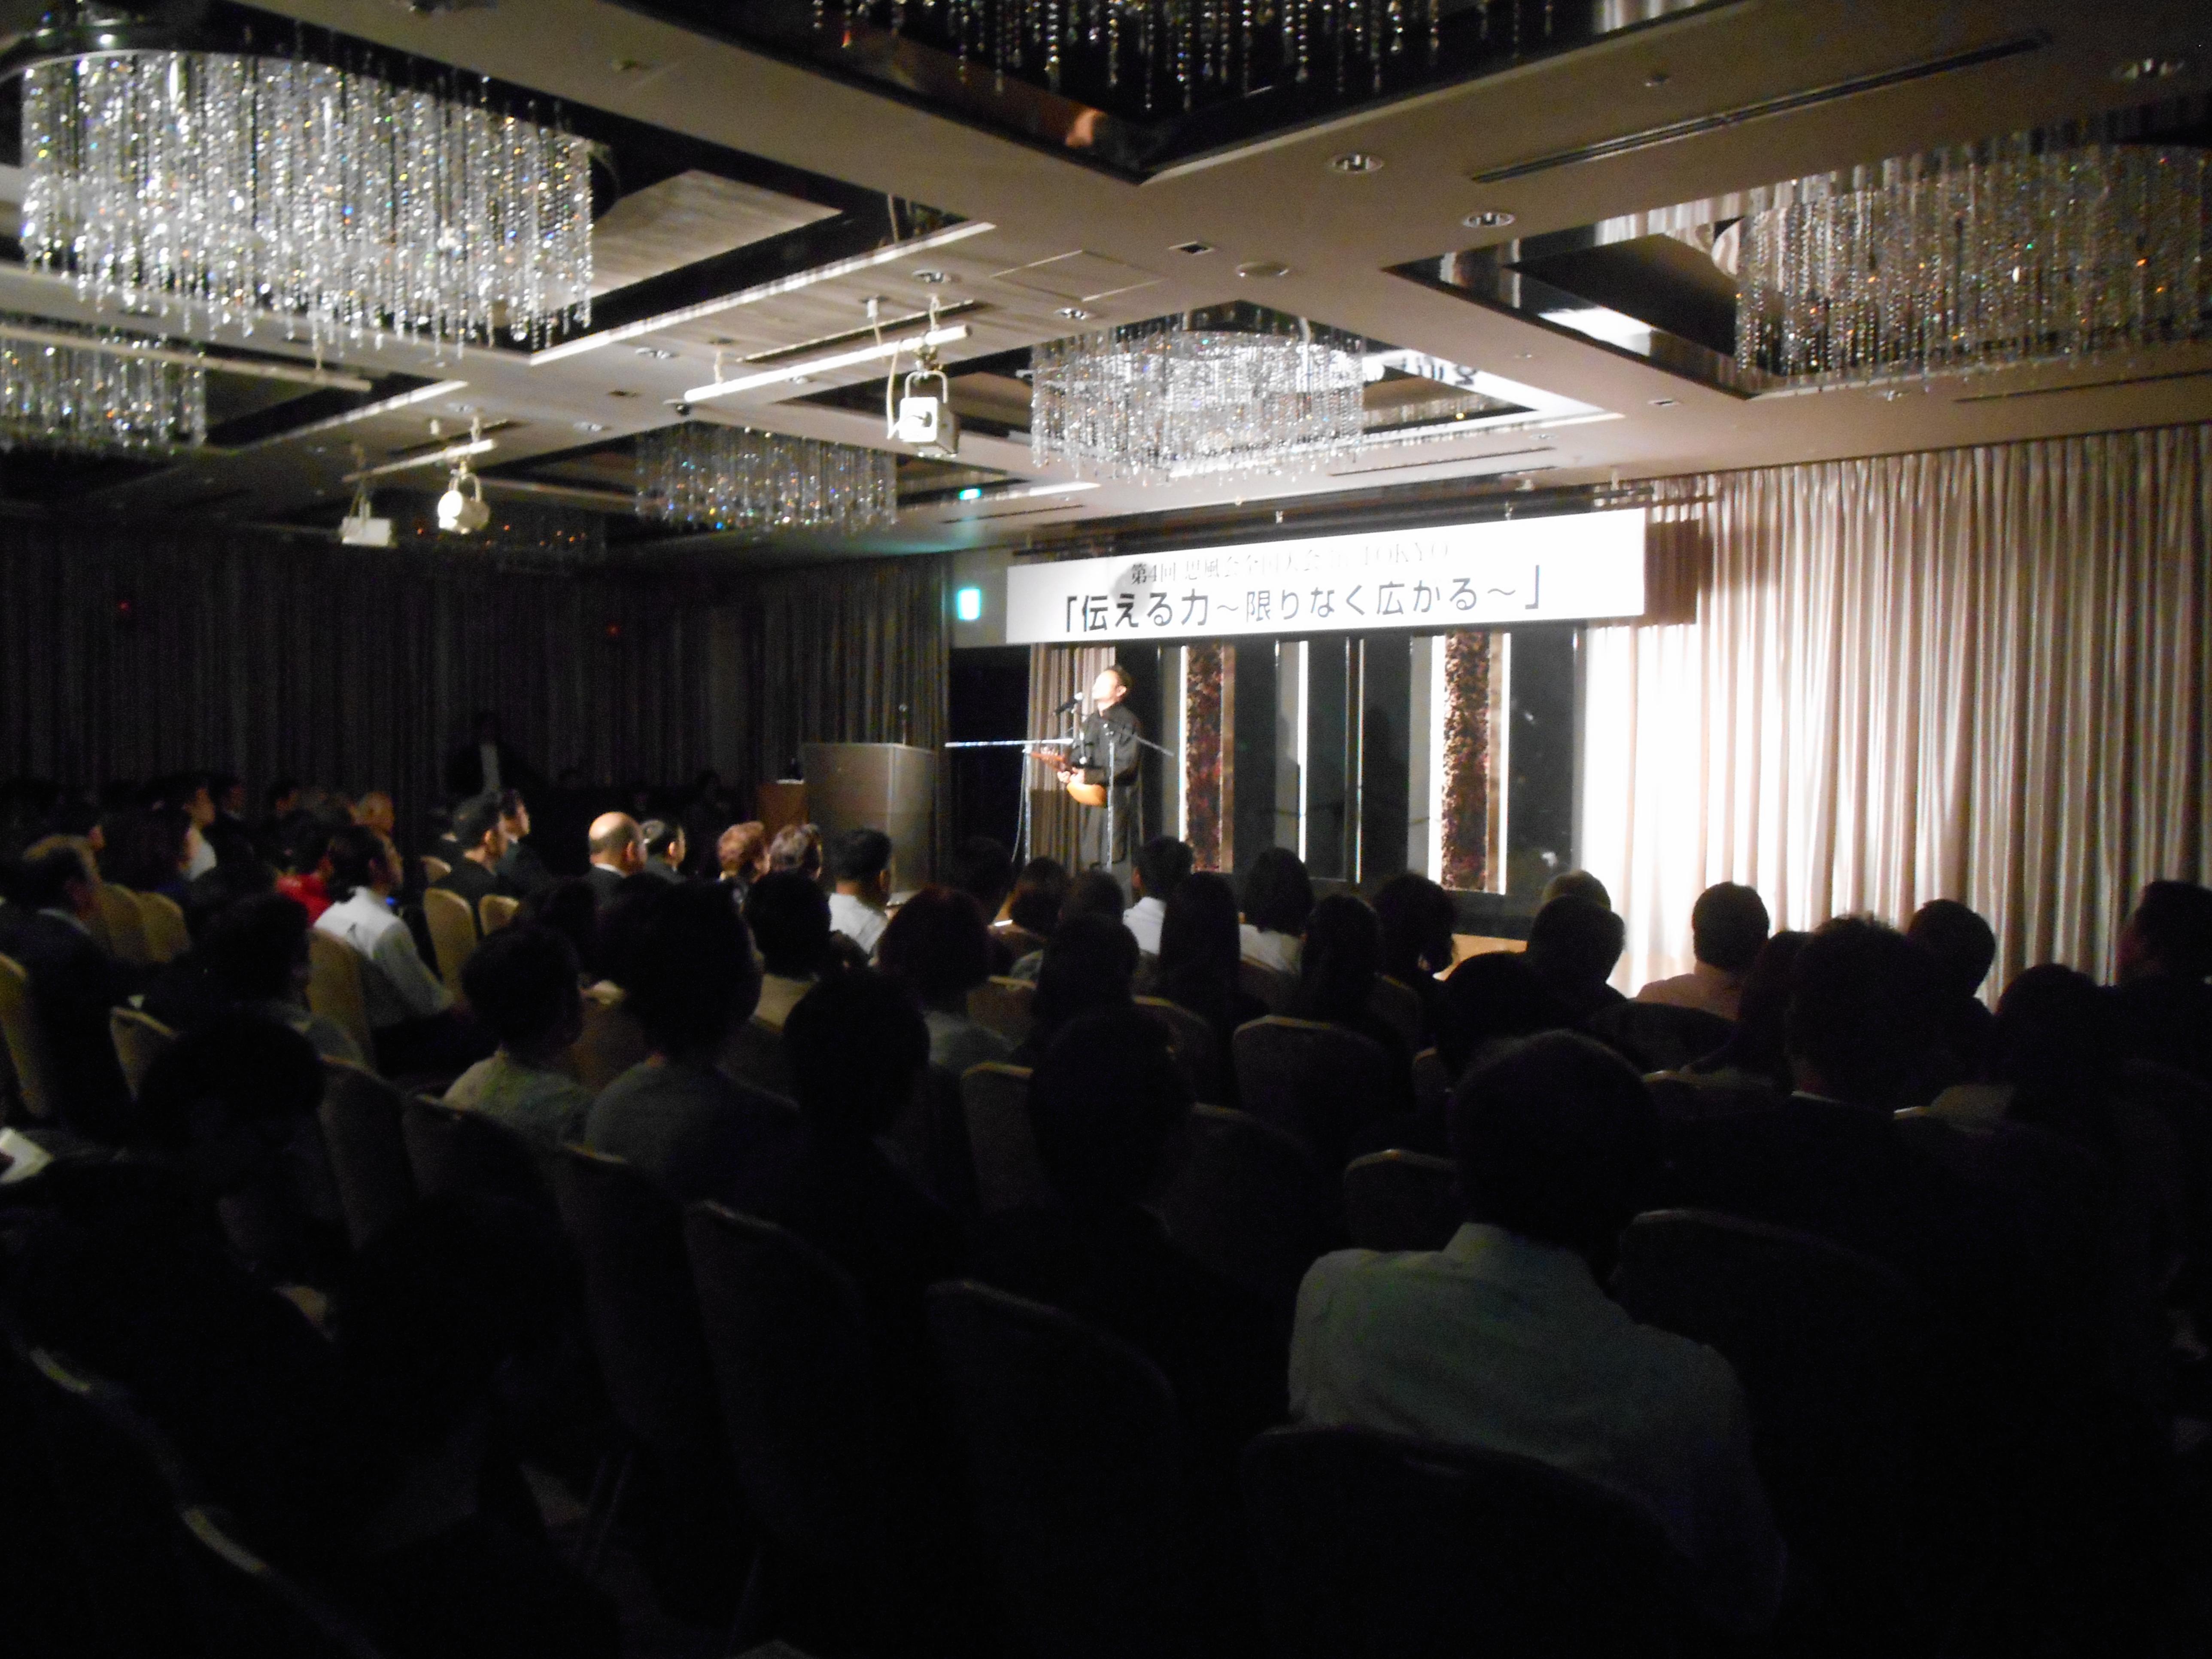 DSCN2045 - 平成30年度 東京思風塾 4月7日(土)「時代が問題をつくり、問題が人物をつくる」